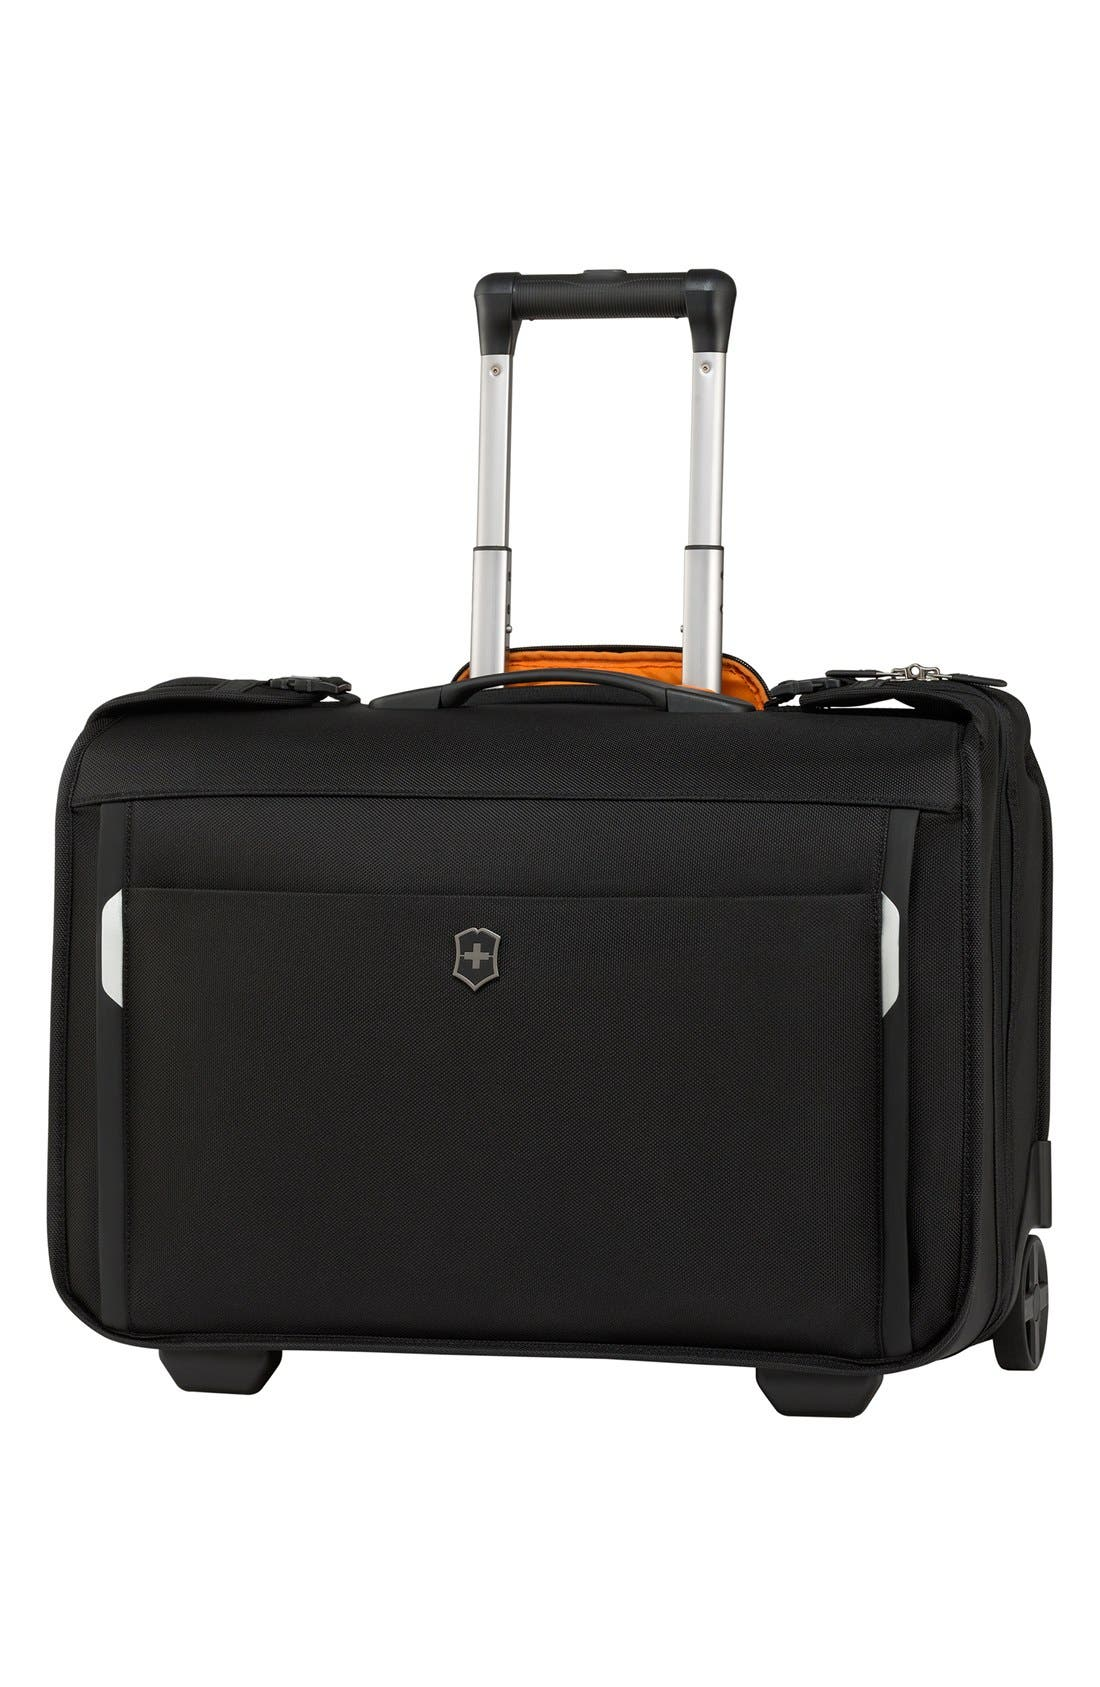 WT 5.0 - East/West Wheeled Garment Bag,                             Main thumbnail 1, color,                             001